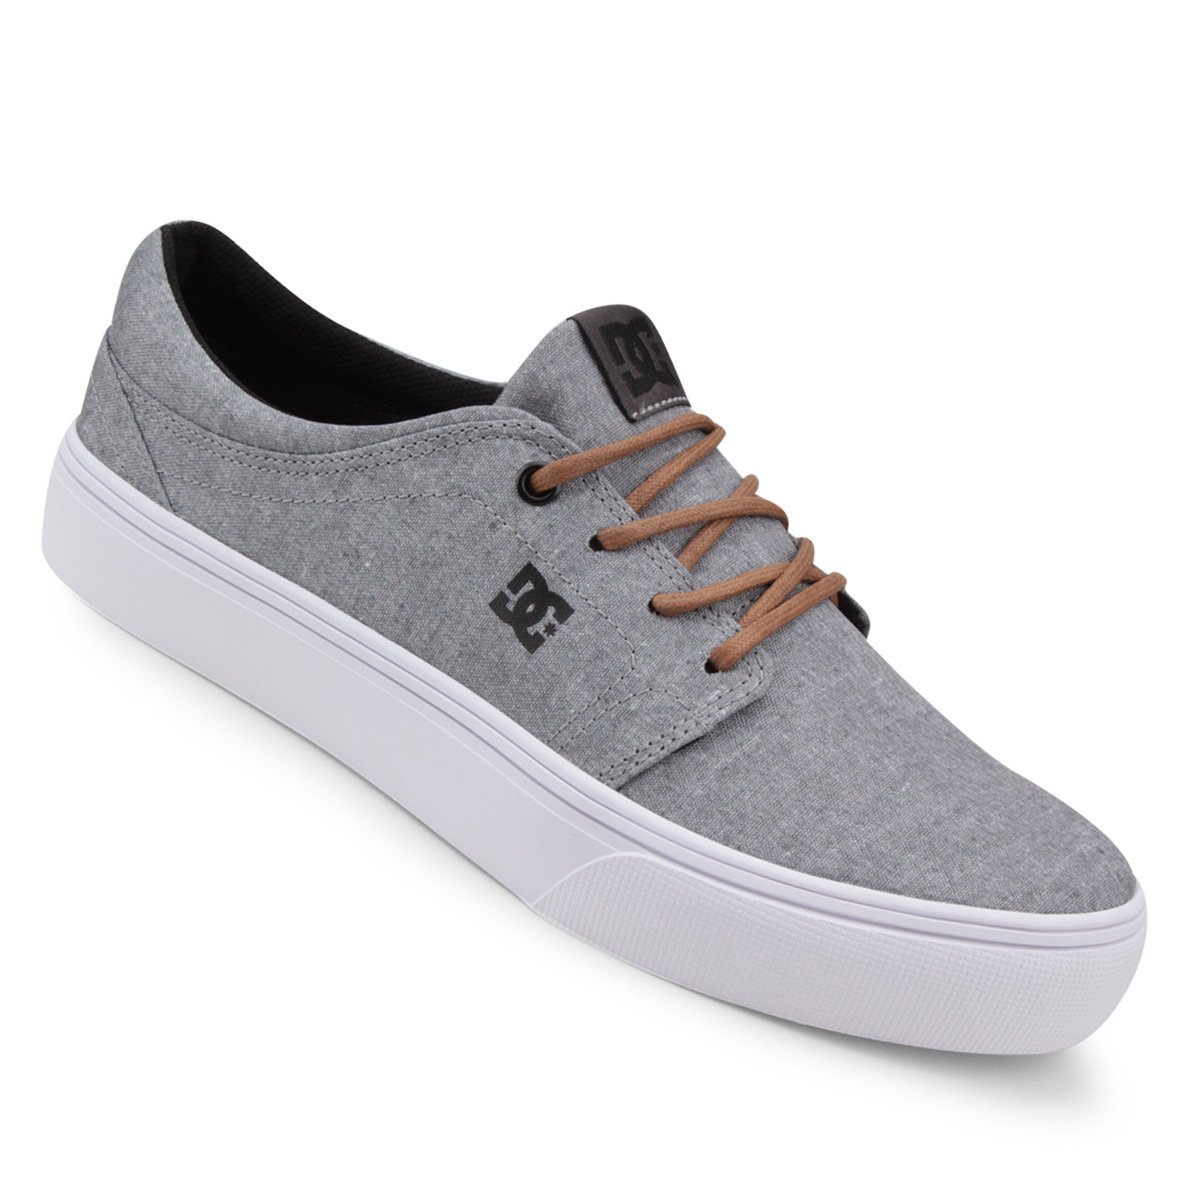 6a636def5a Tênis DC Shoes Trase Tx Se Masculino - Cinza - Compre Agora